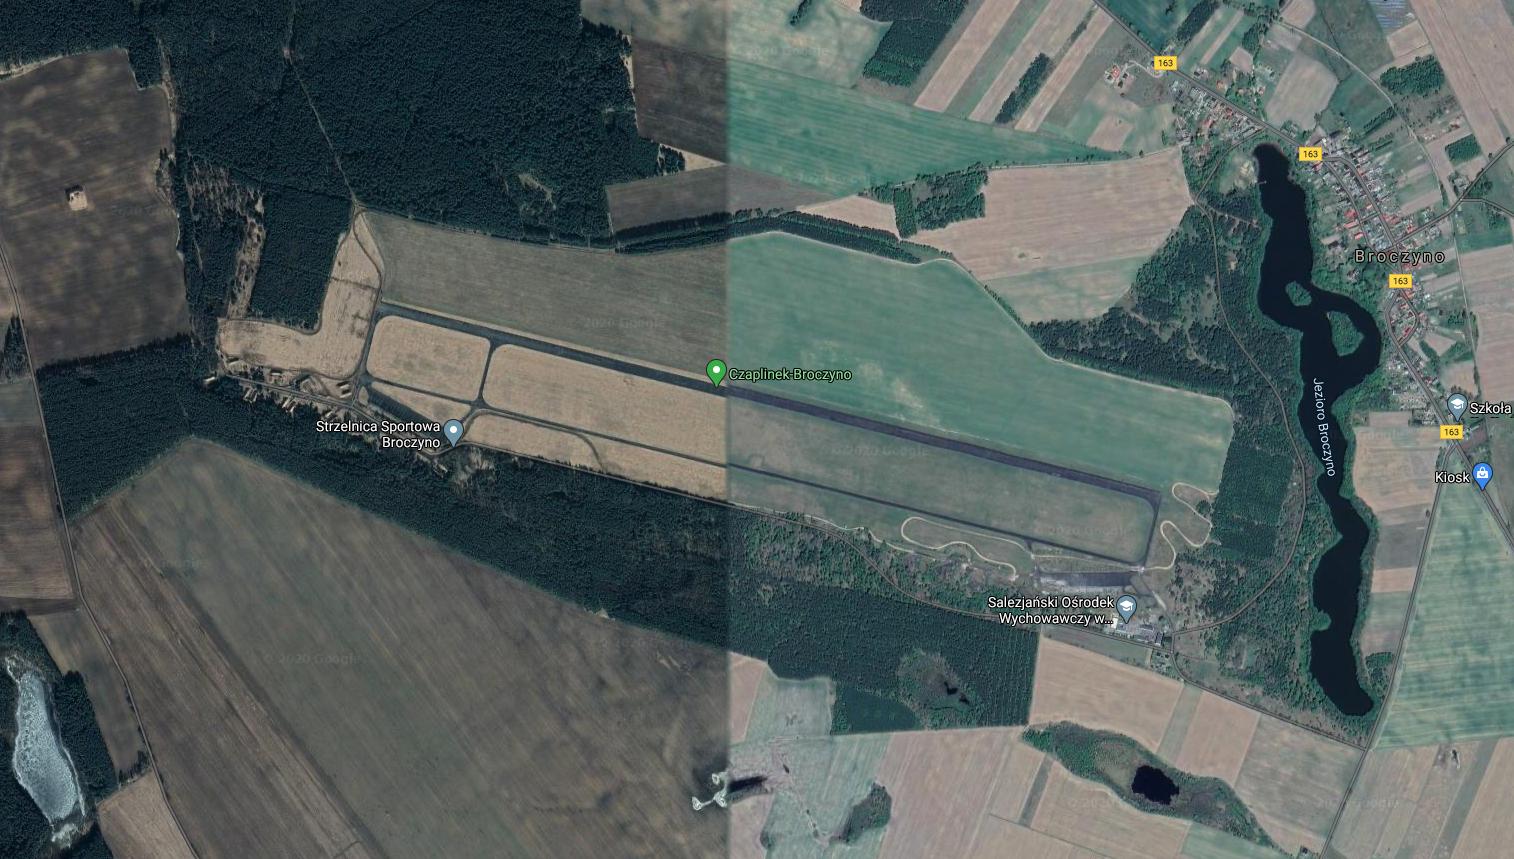 Czaplinek Broczyno airport, satellite view. 2018 year. Photo of LAC